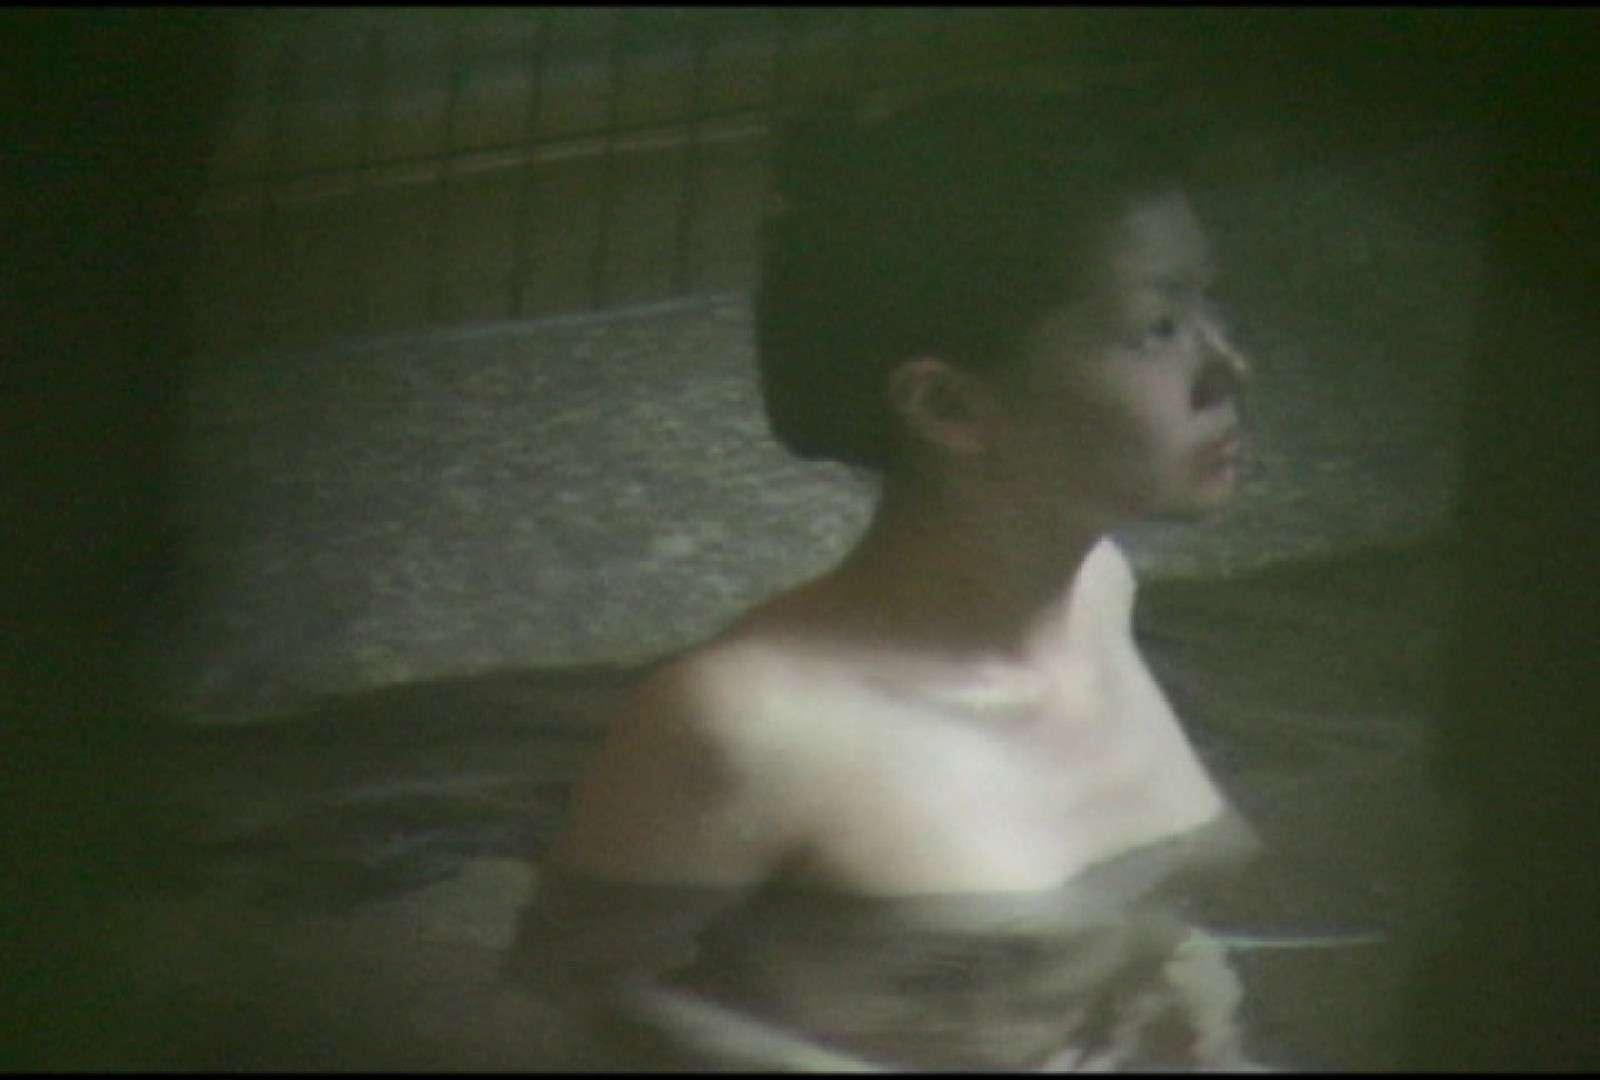 Aquaな露天風呂Vol.699 露天風呂 | OLのエロ生活  104連発 1